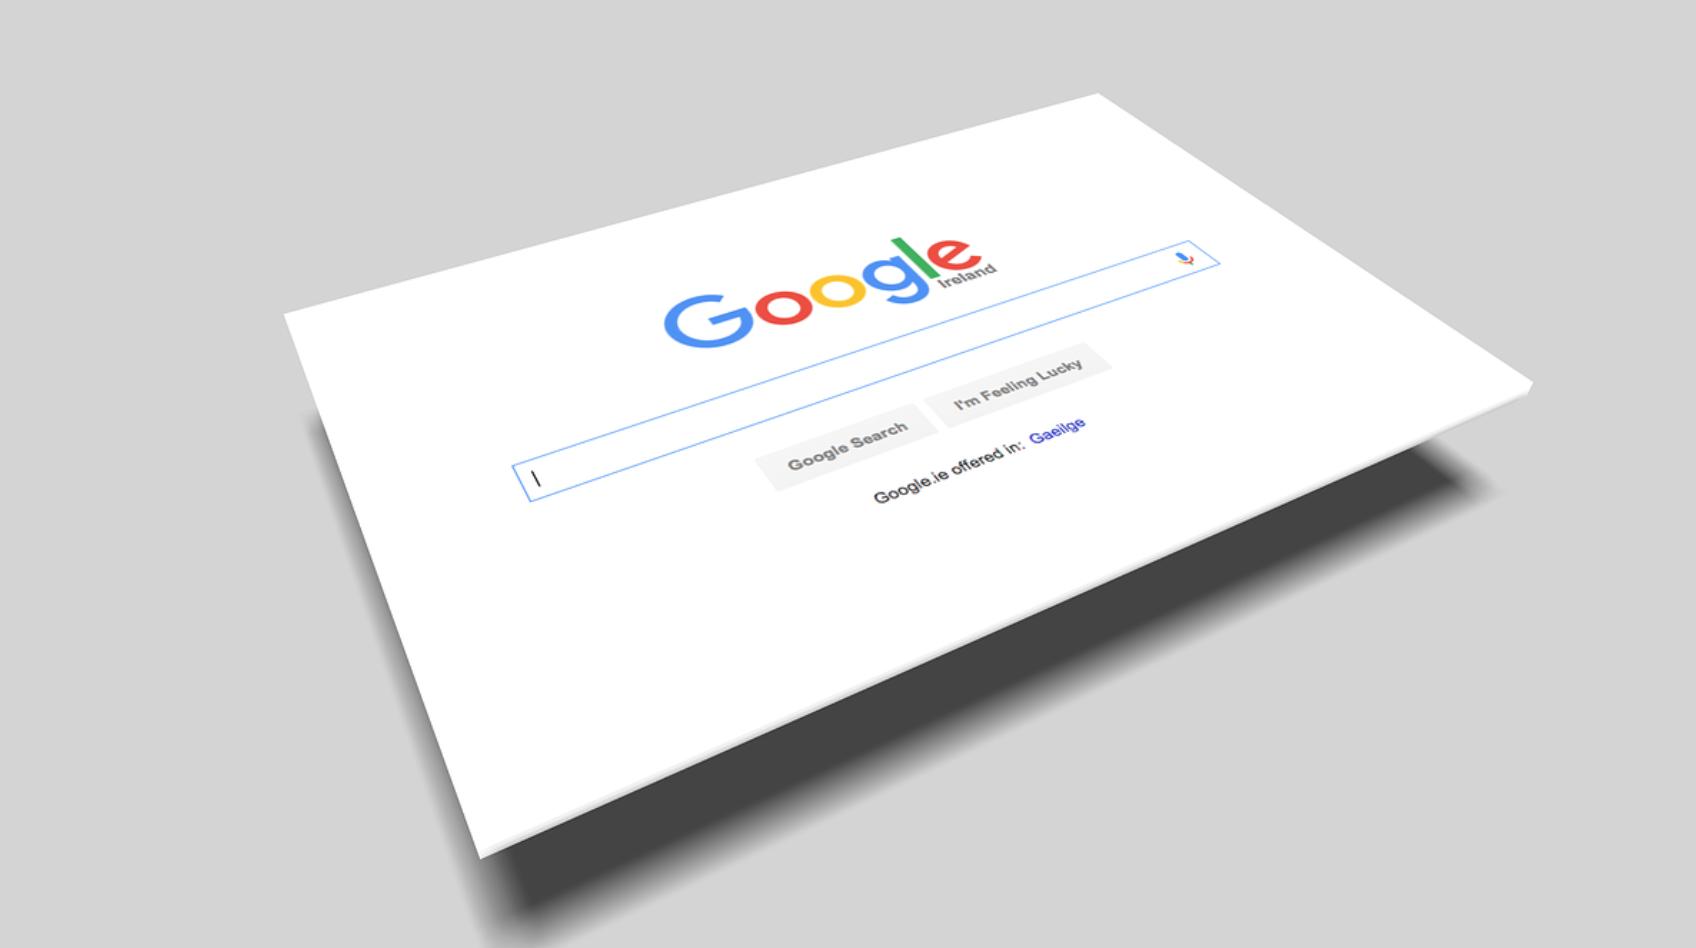 Google検索エンジンの仕組みとSEO対策について